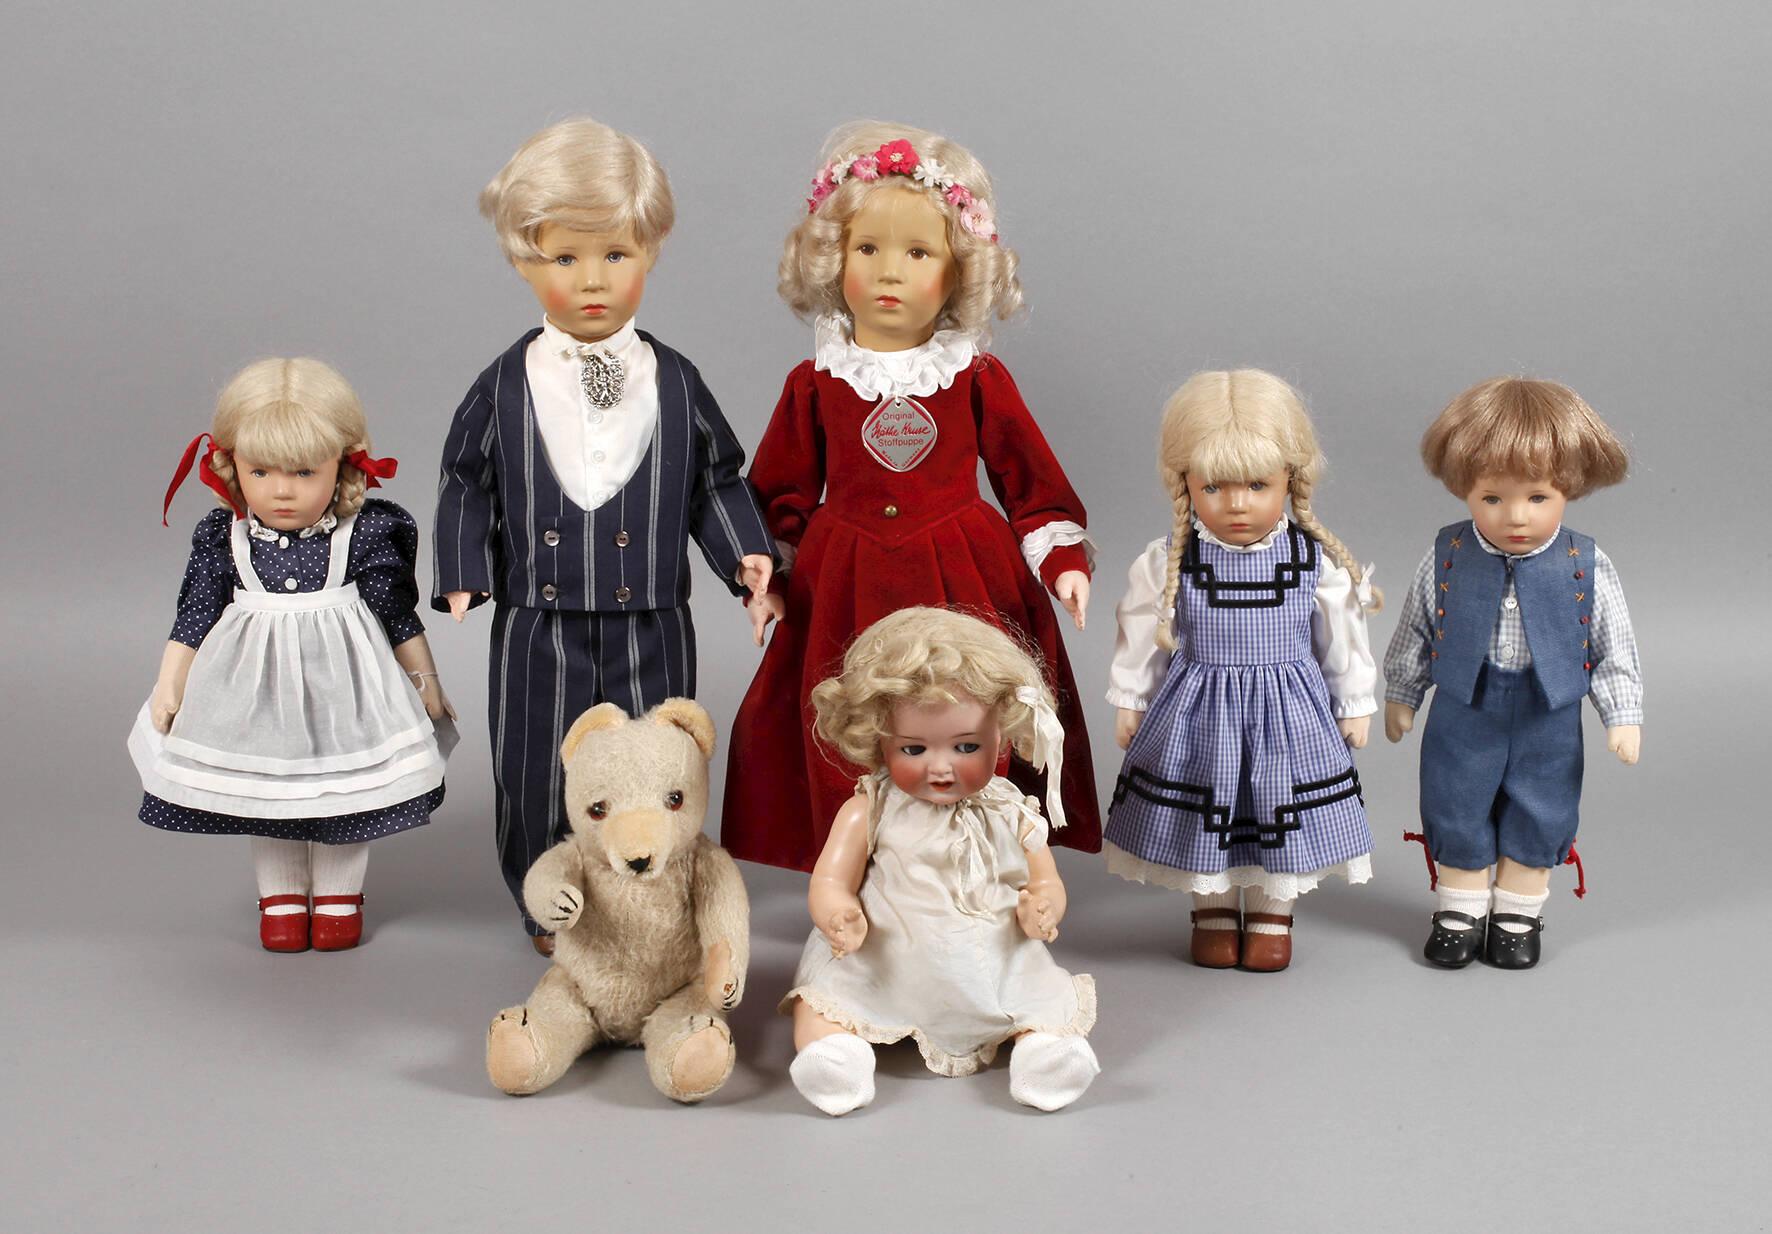 Sammlung Käthe Kruse Puppen und Teddy